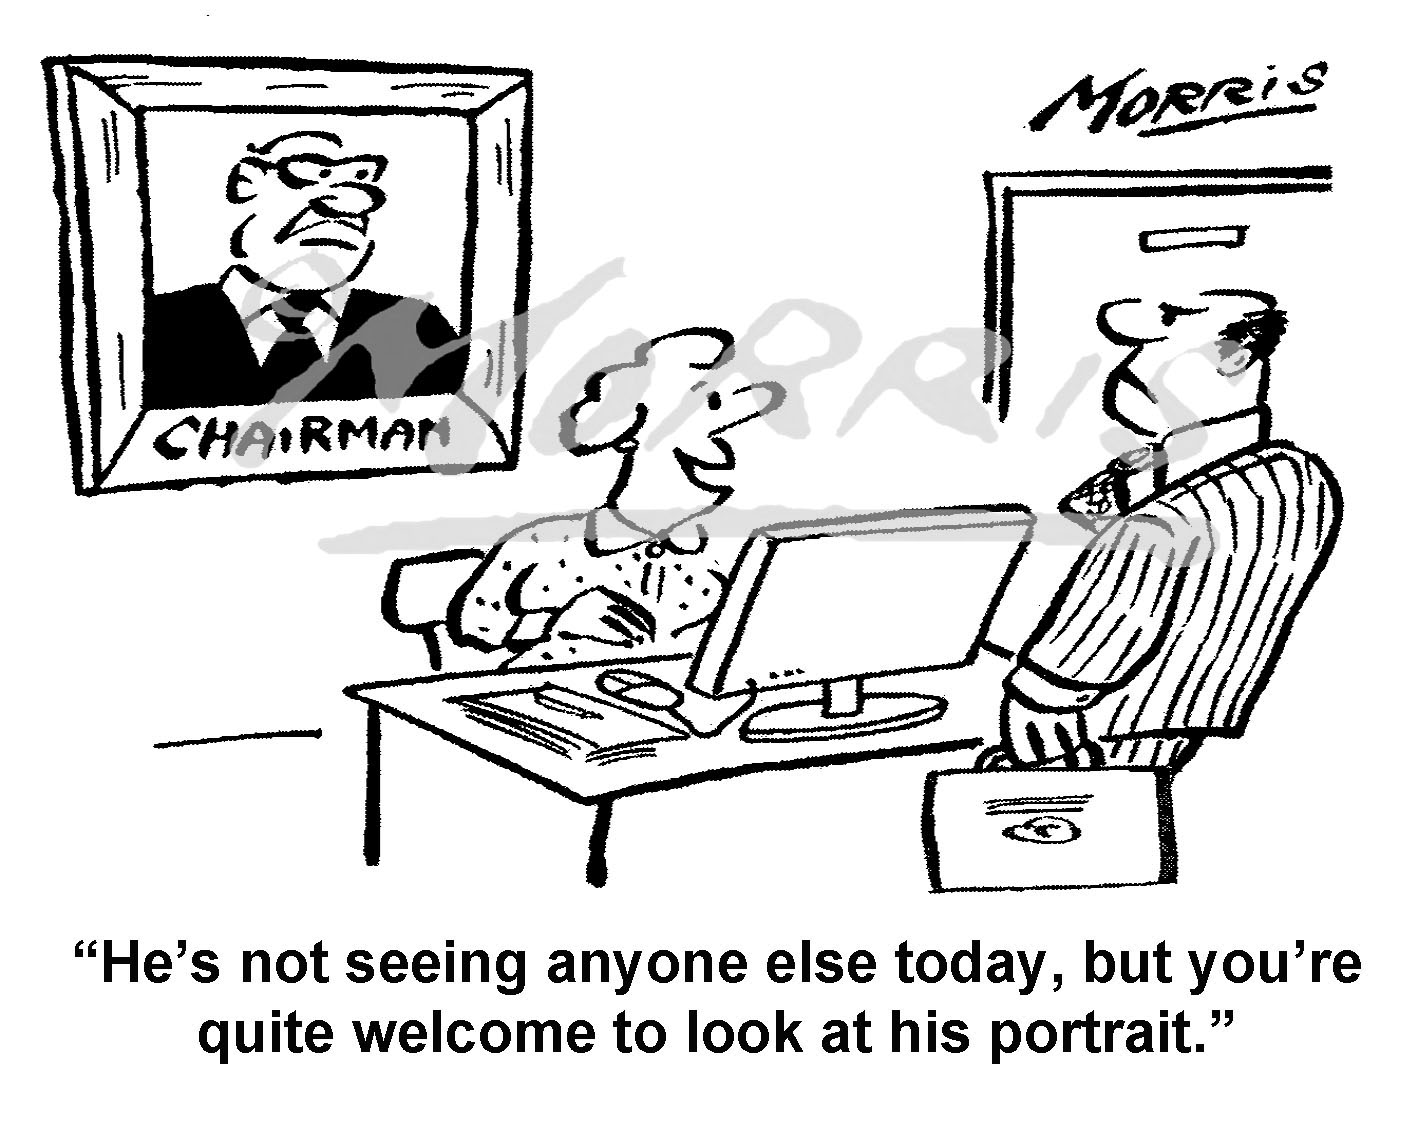 Chairman portrait cartoon – Ref: 7388bw